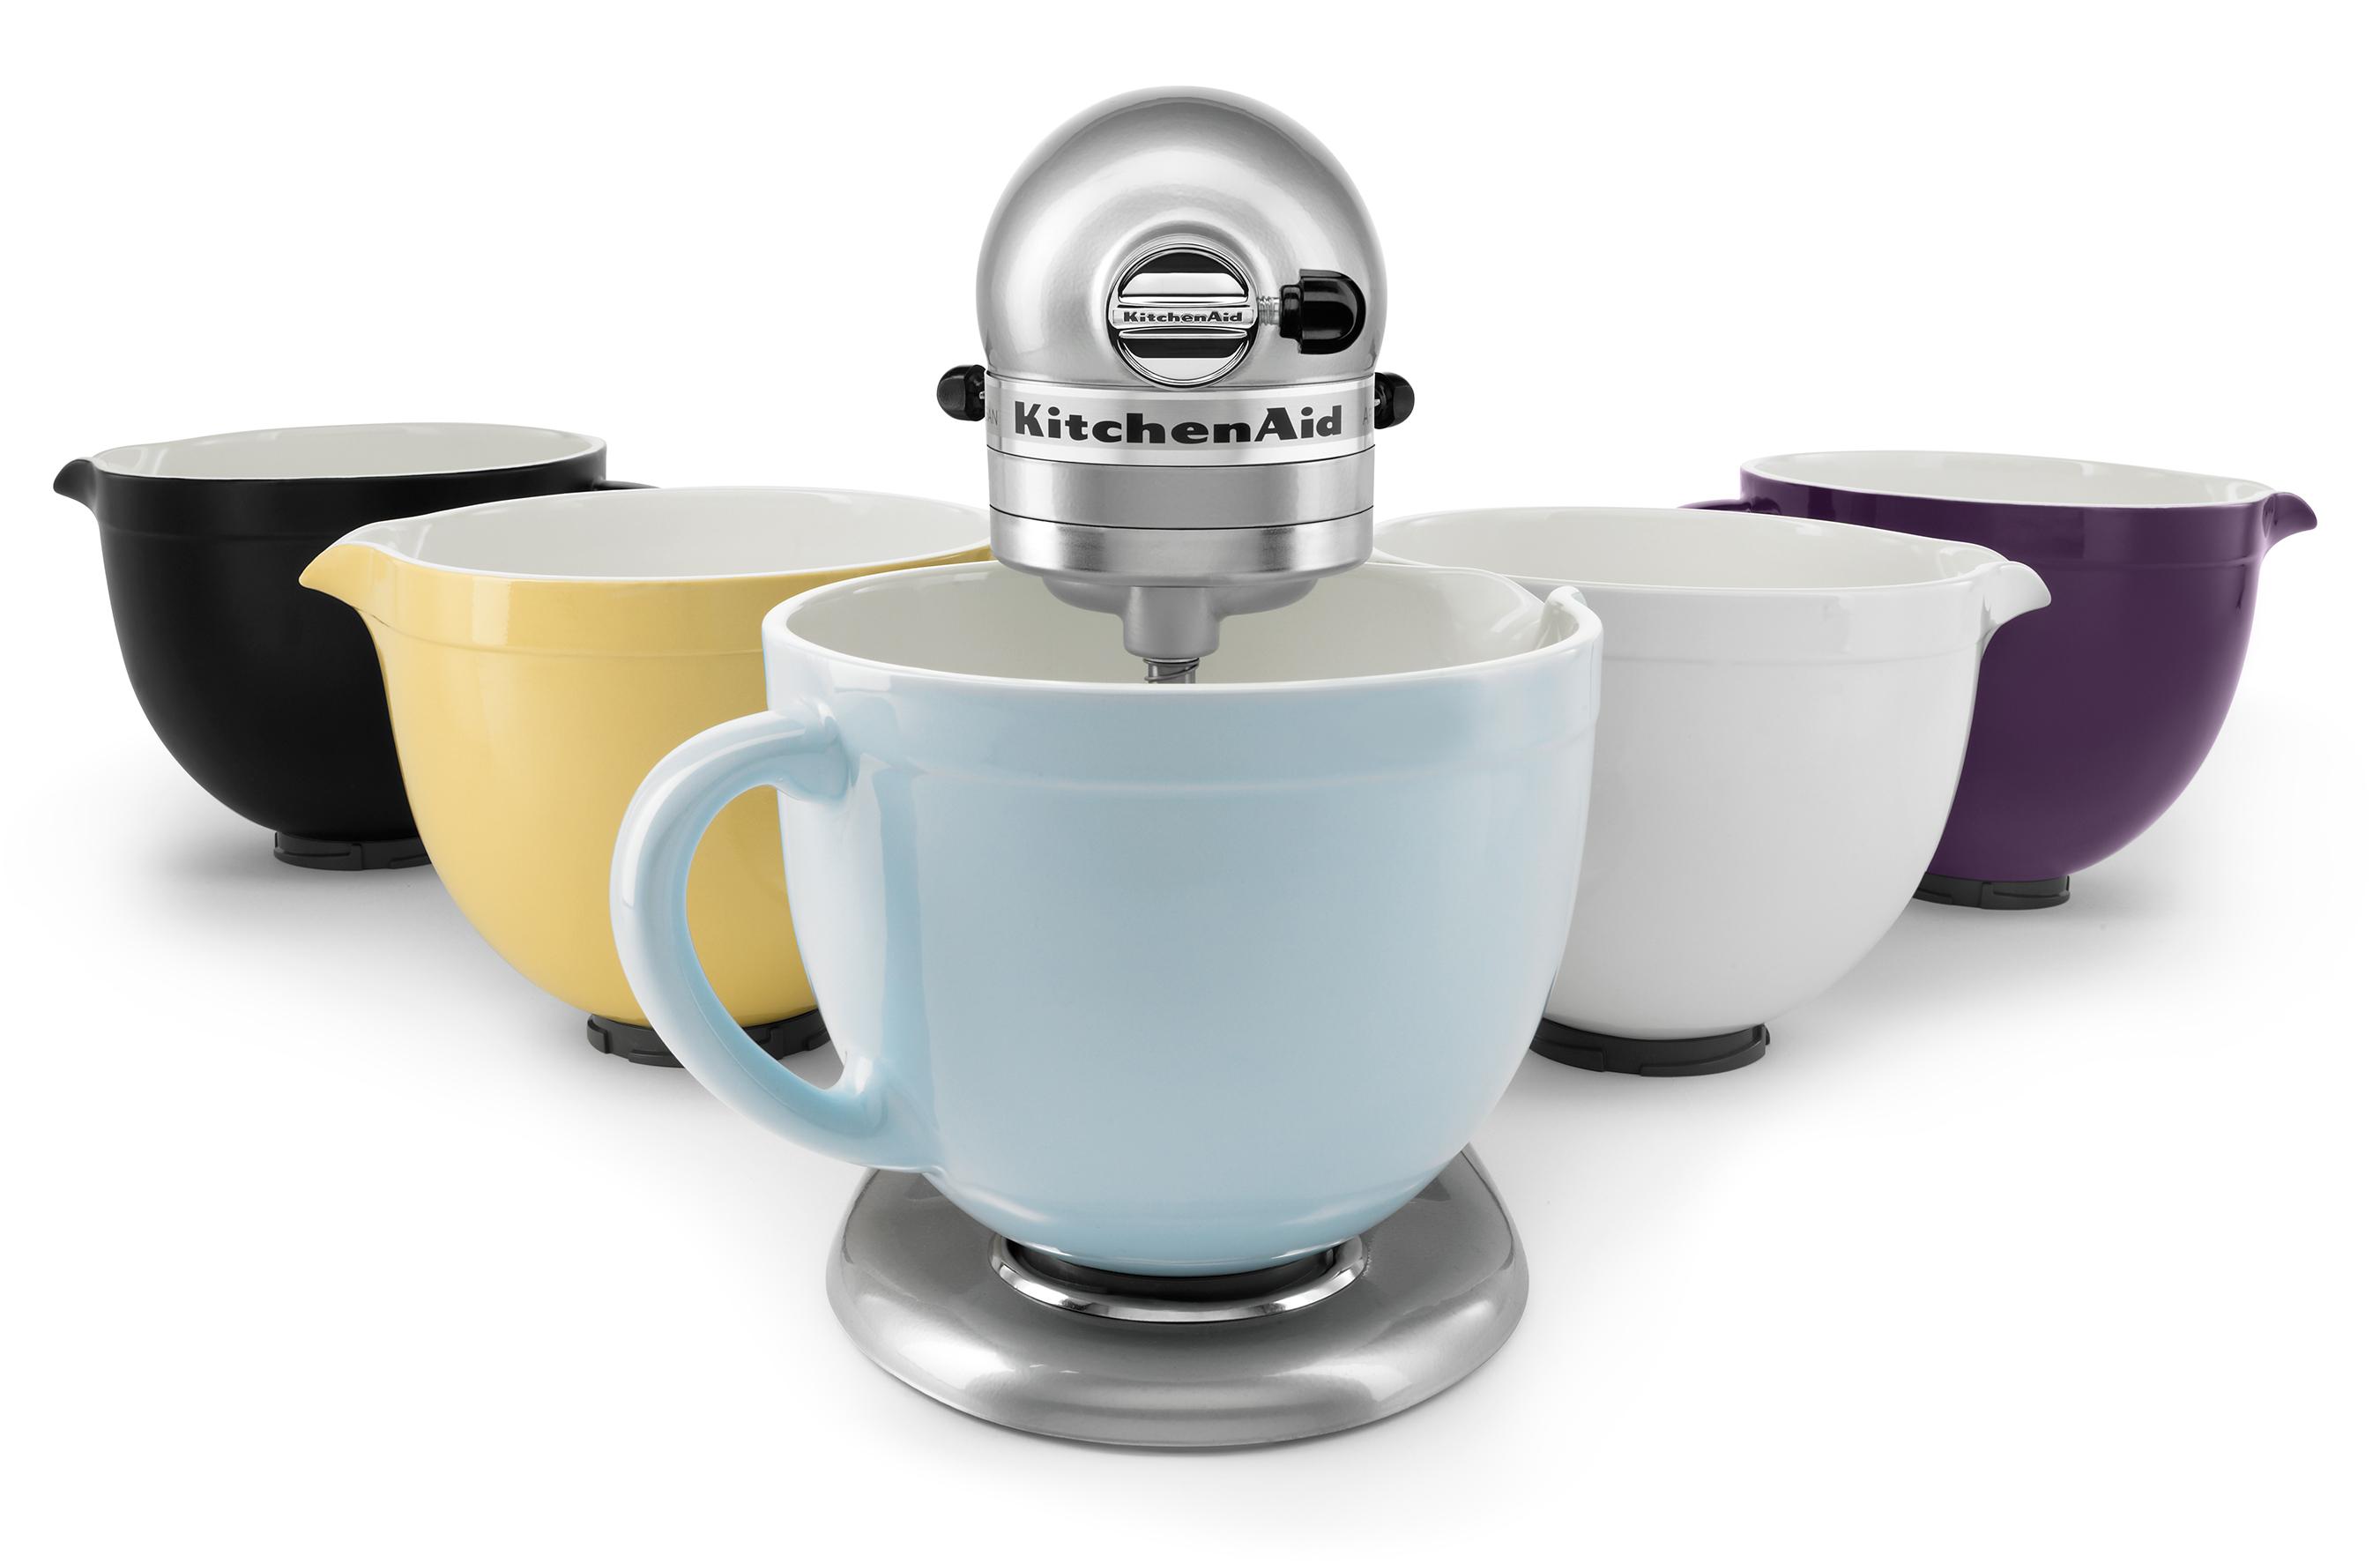 kitchen aid mixer accessories good quality utensils attachments